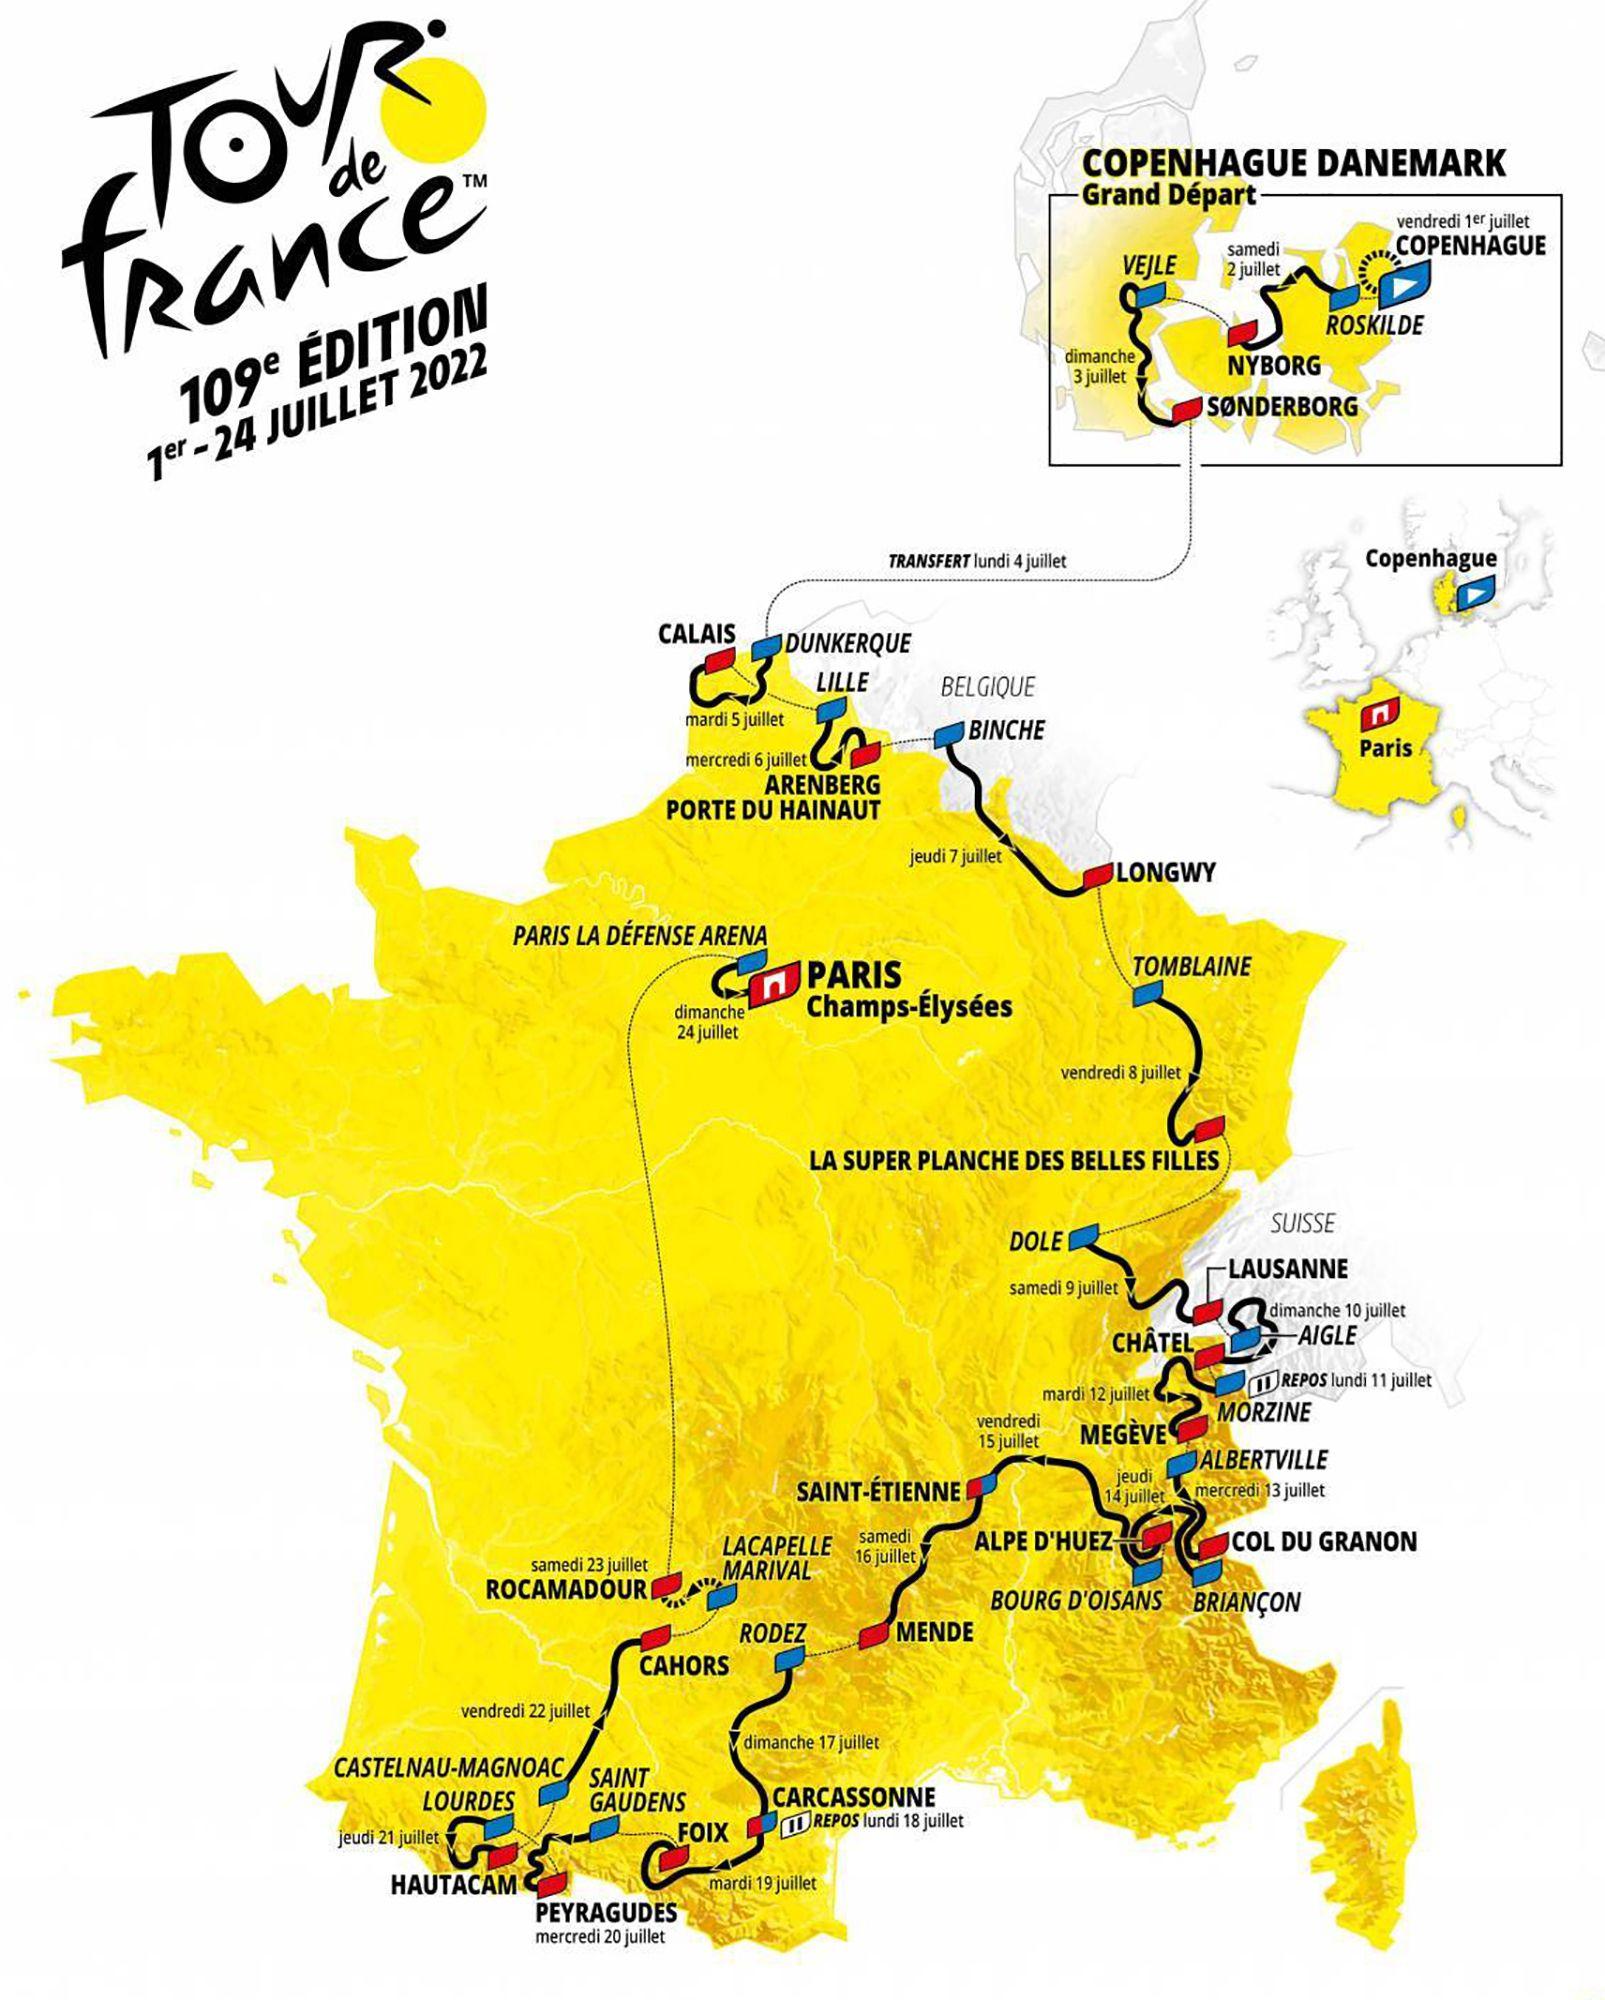 el mitico alpe dhuez regresa al tour de francia